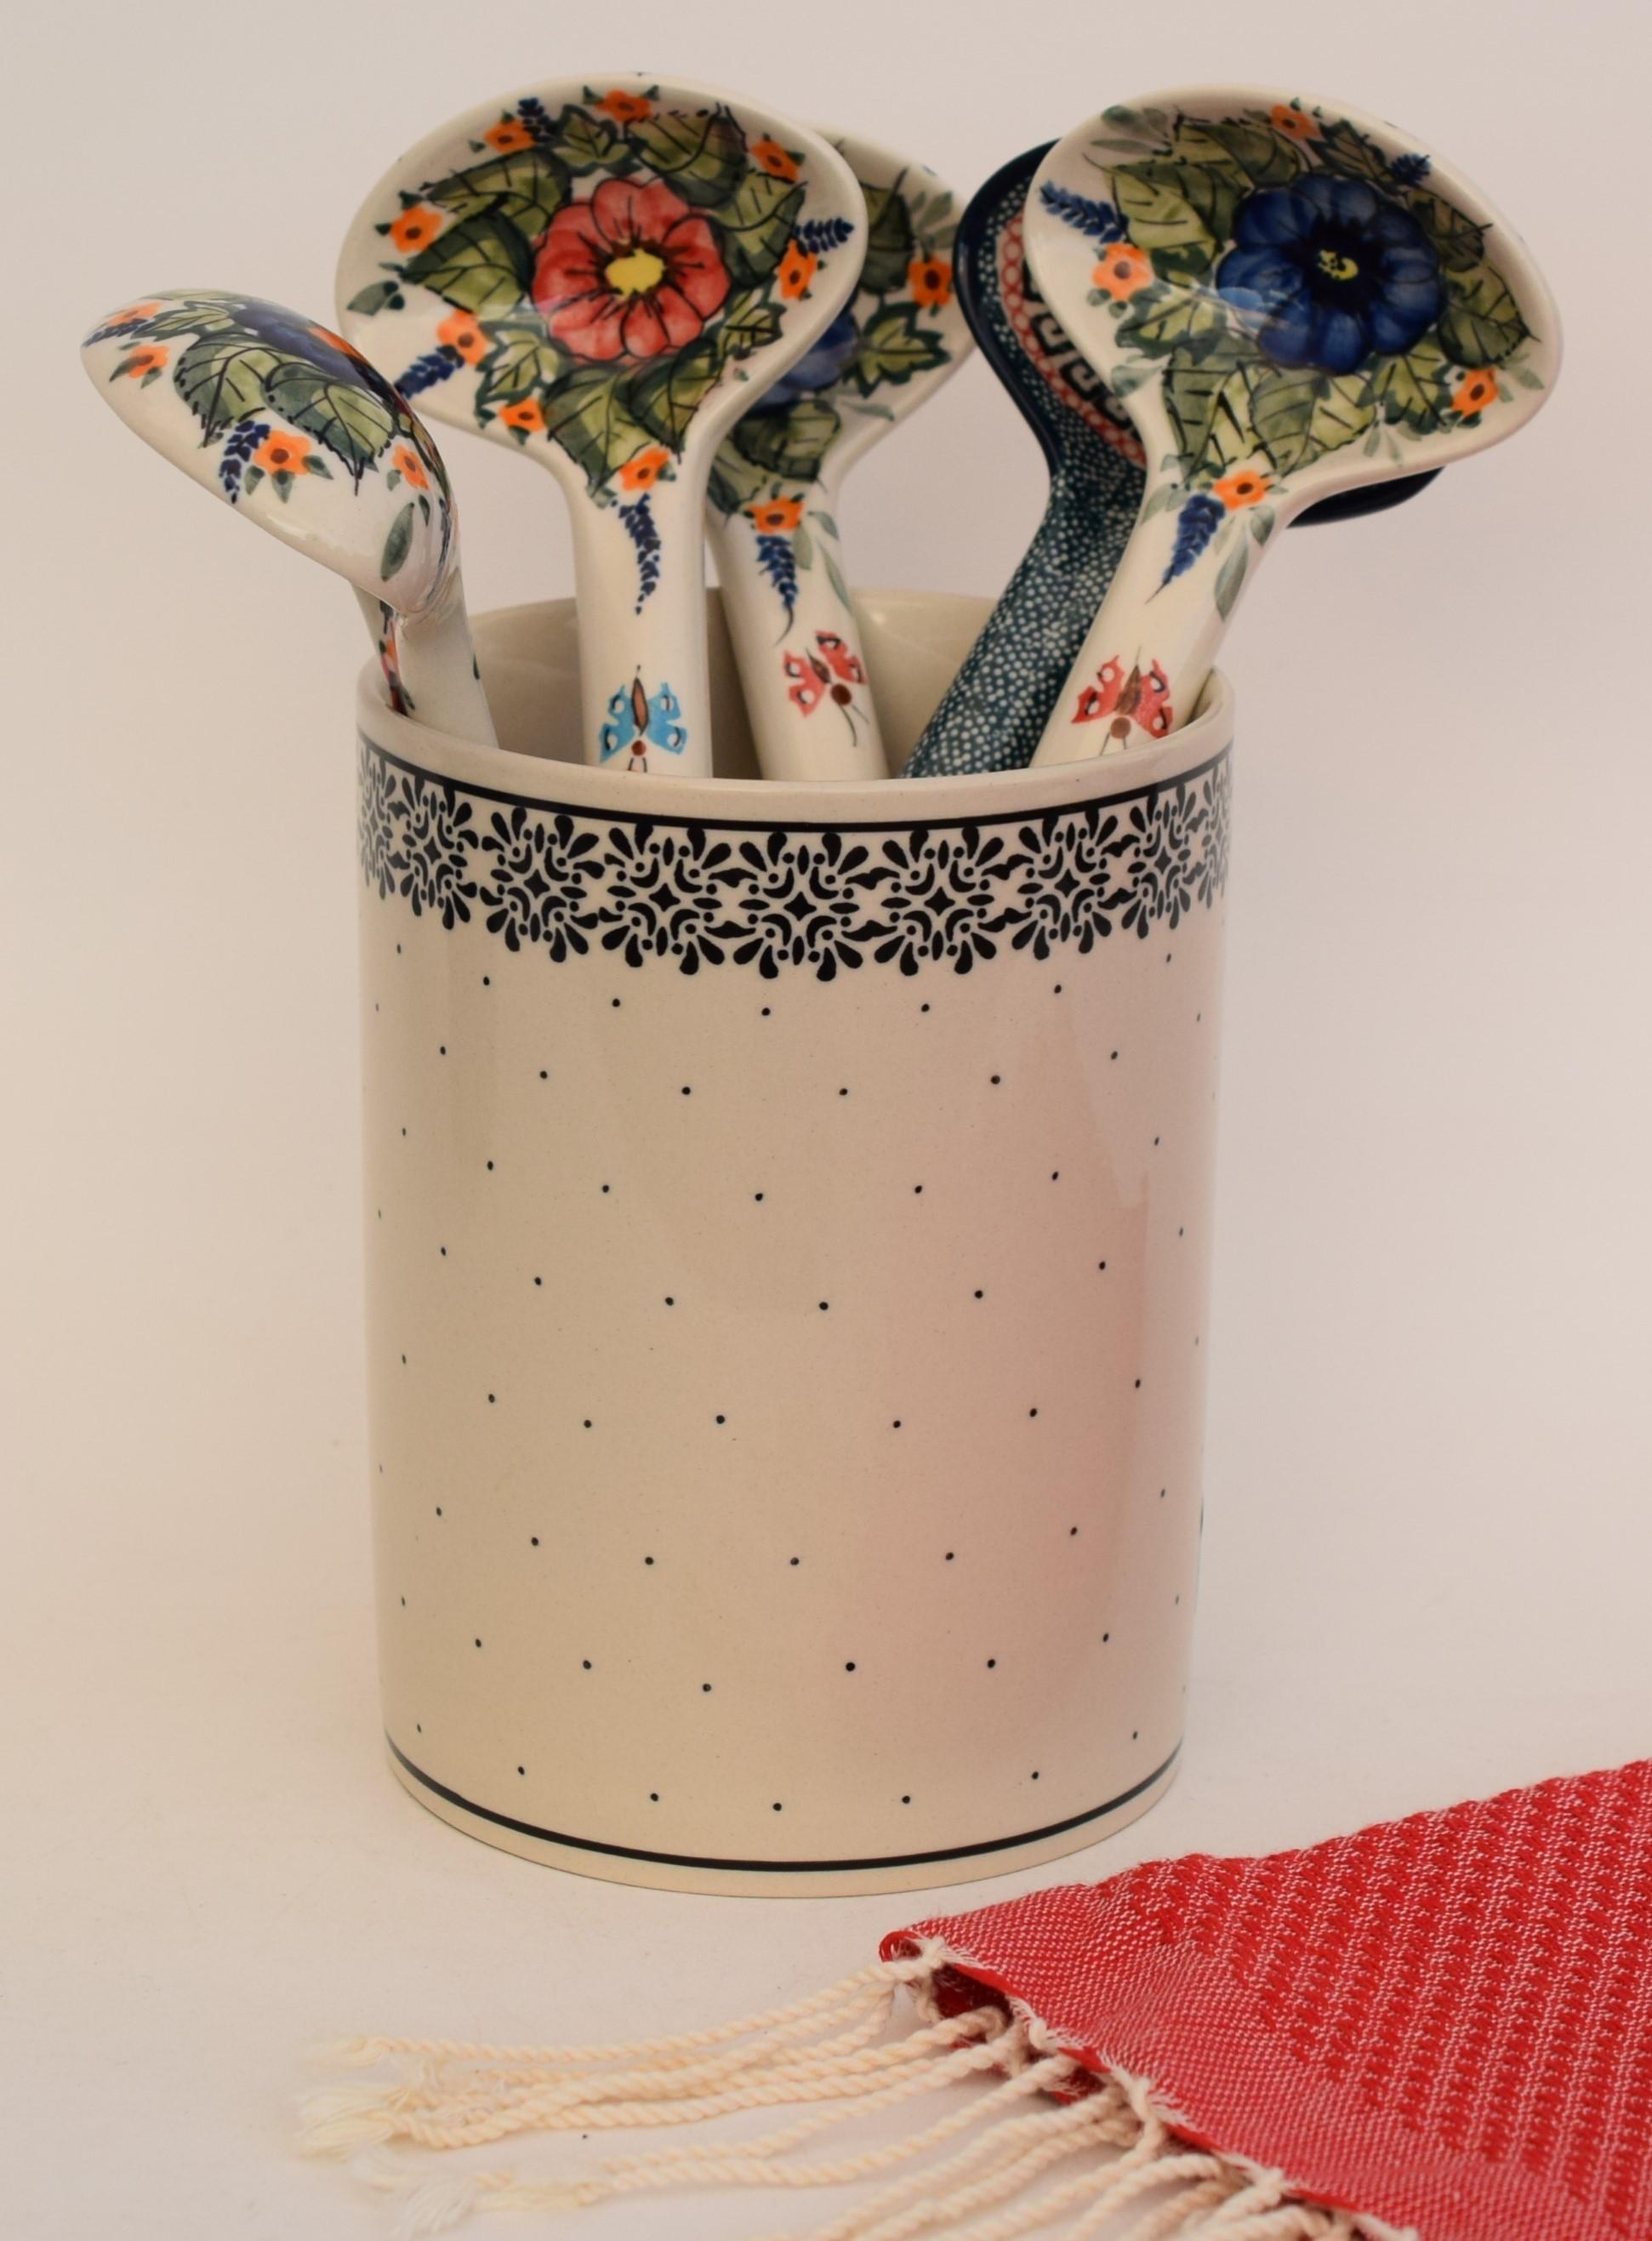 Pottery Avenue Trendy Times 7-inch Stoneware Utensil Jar-Crock - 832-957